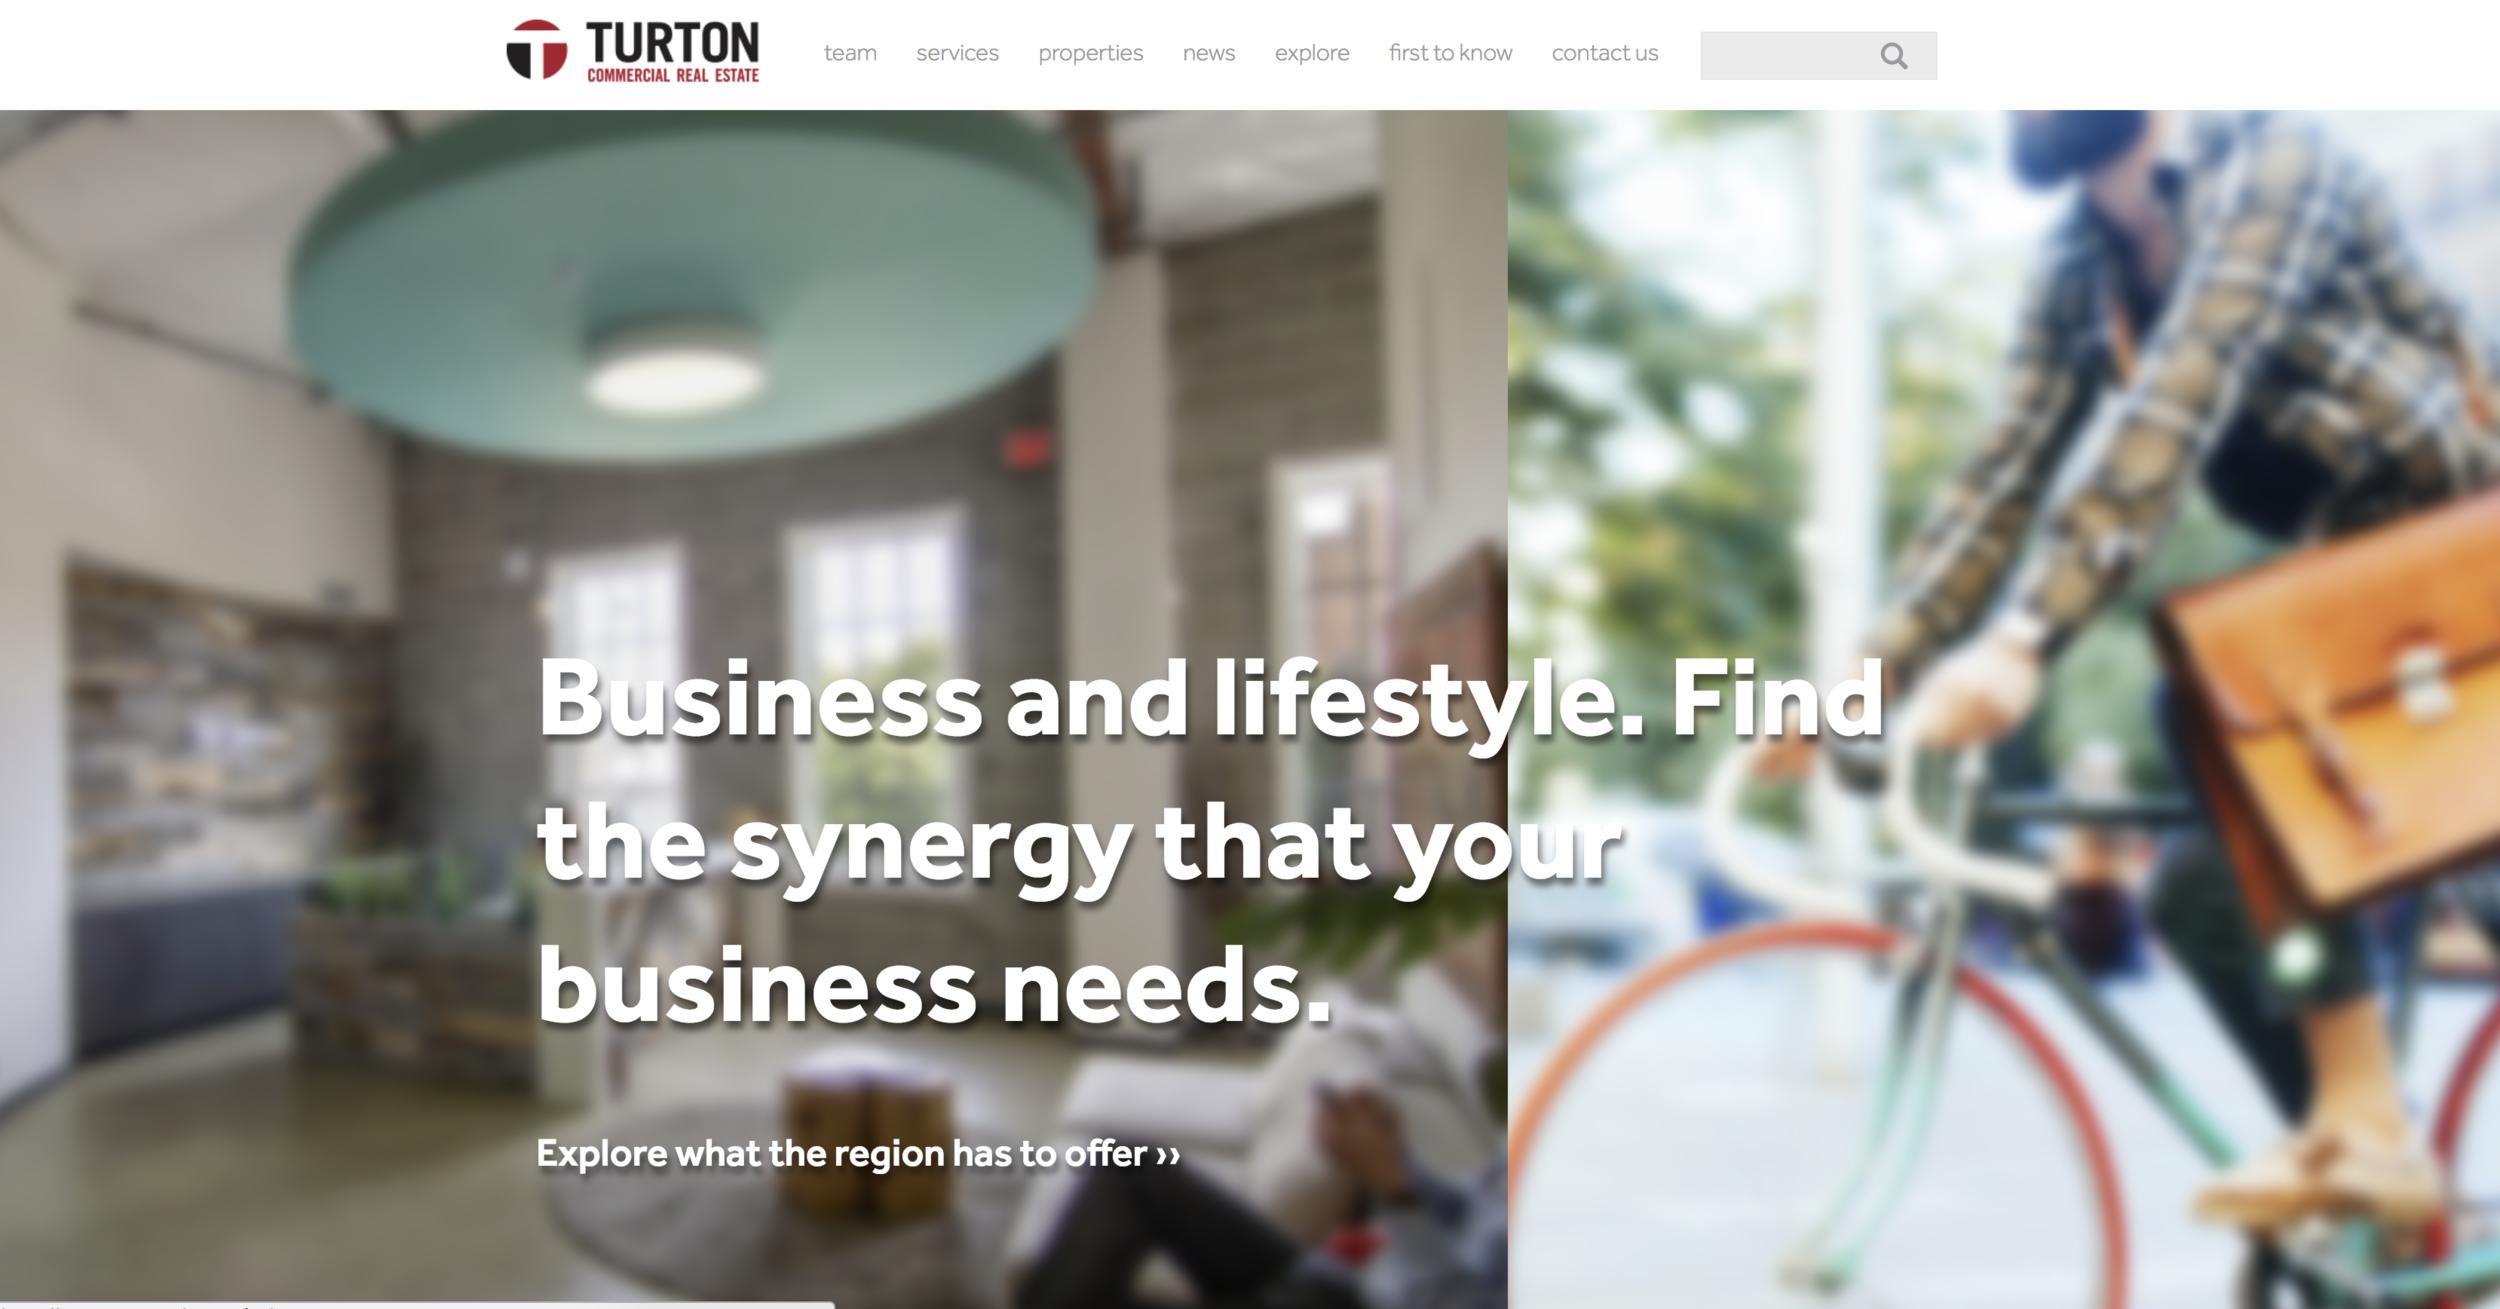 Turton Real Estate